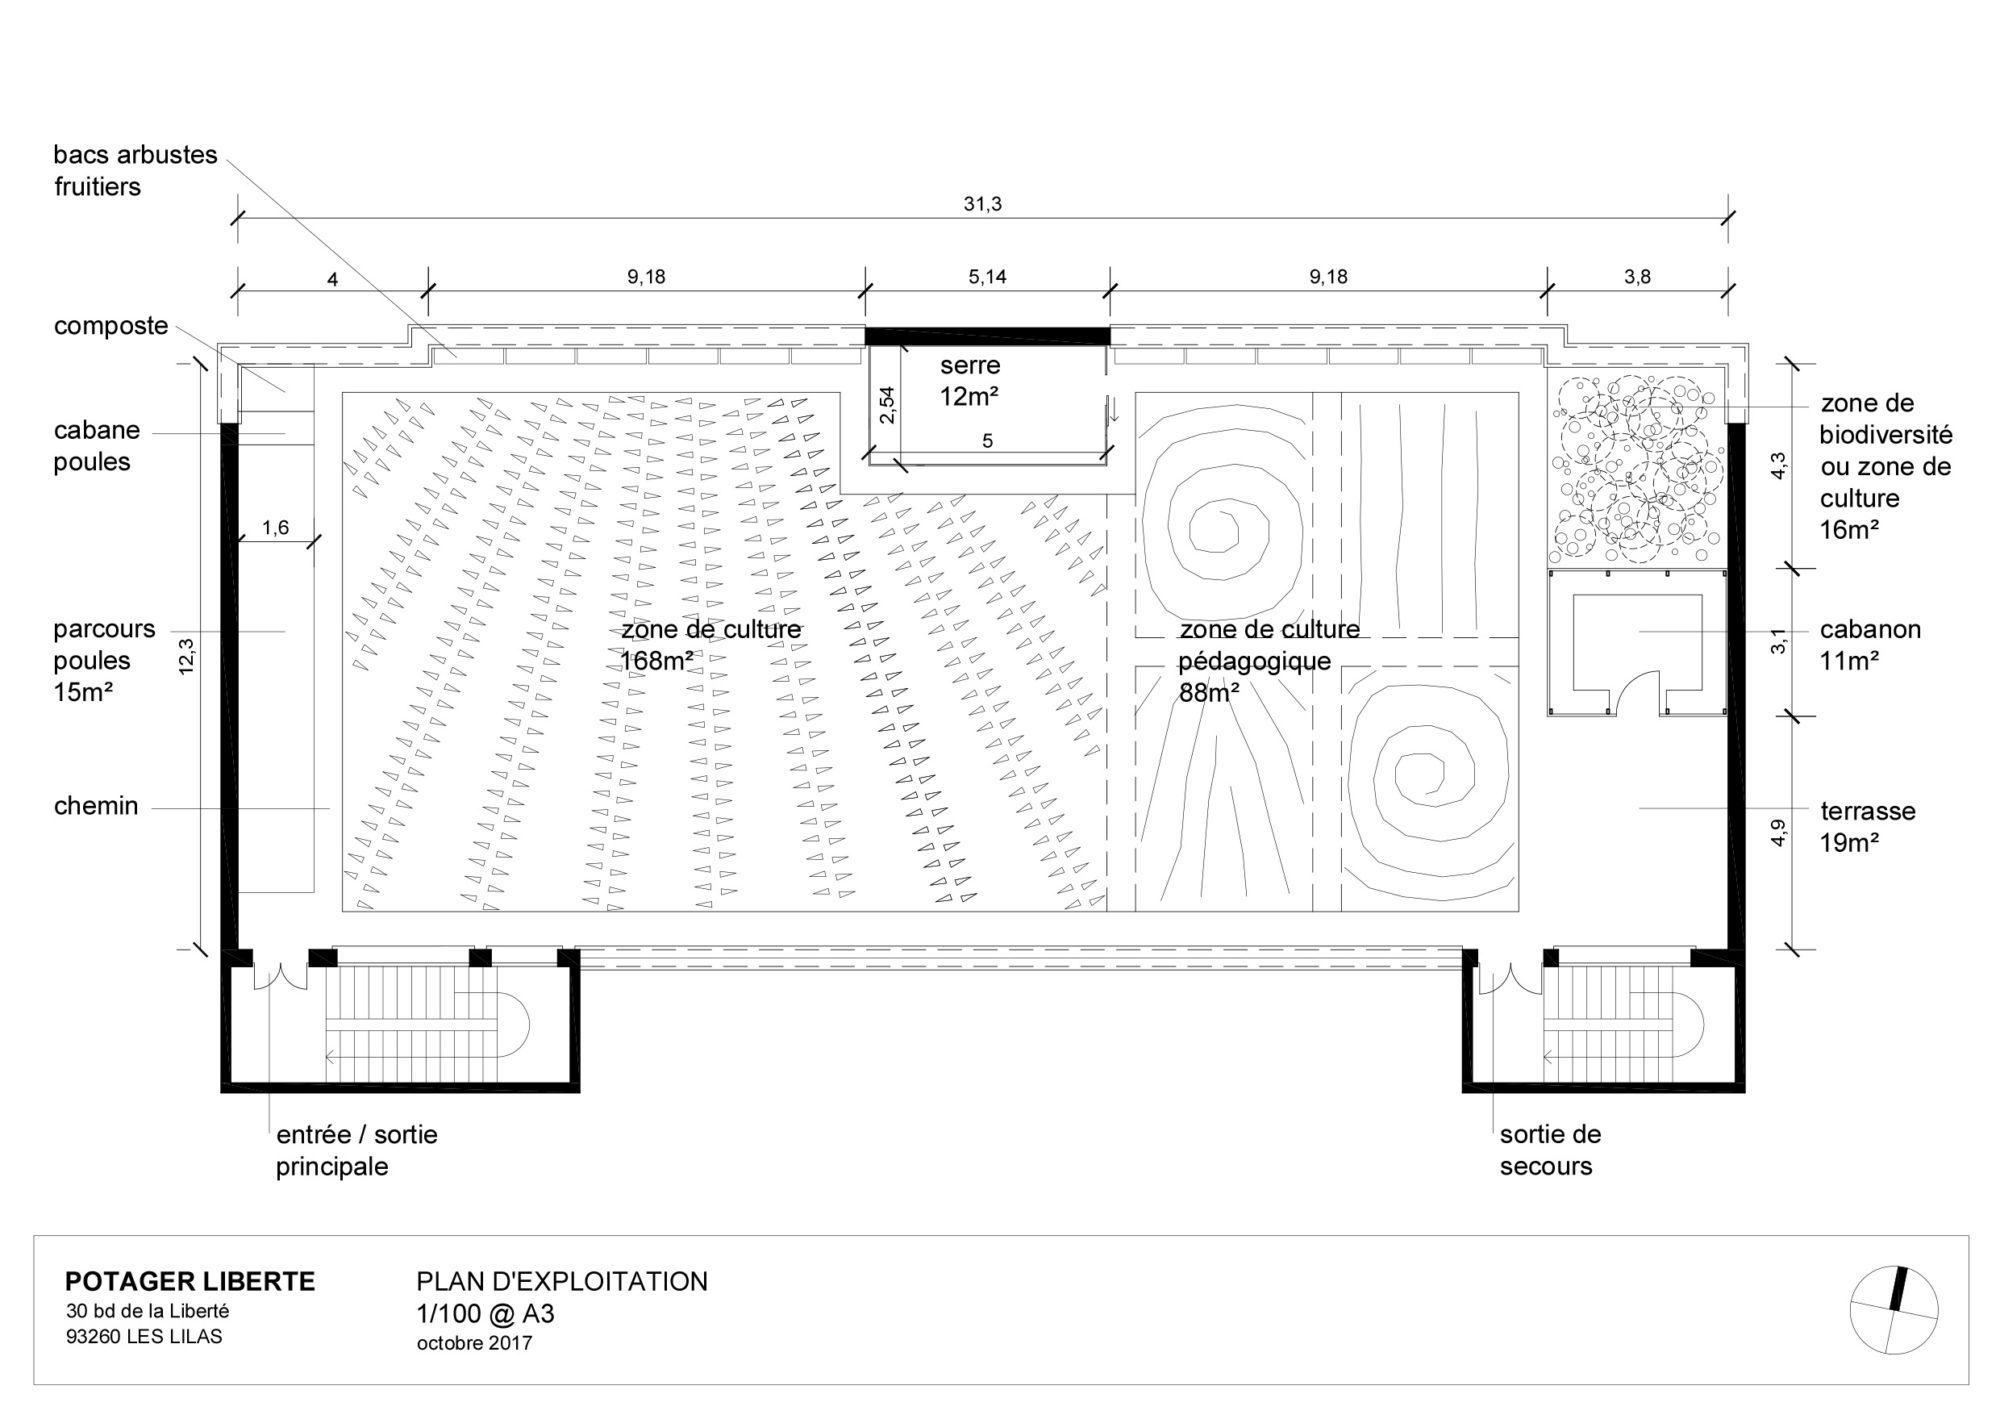 D:AMAPpotager liberteplanstoiture terrasse Layout1 (1)